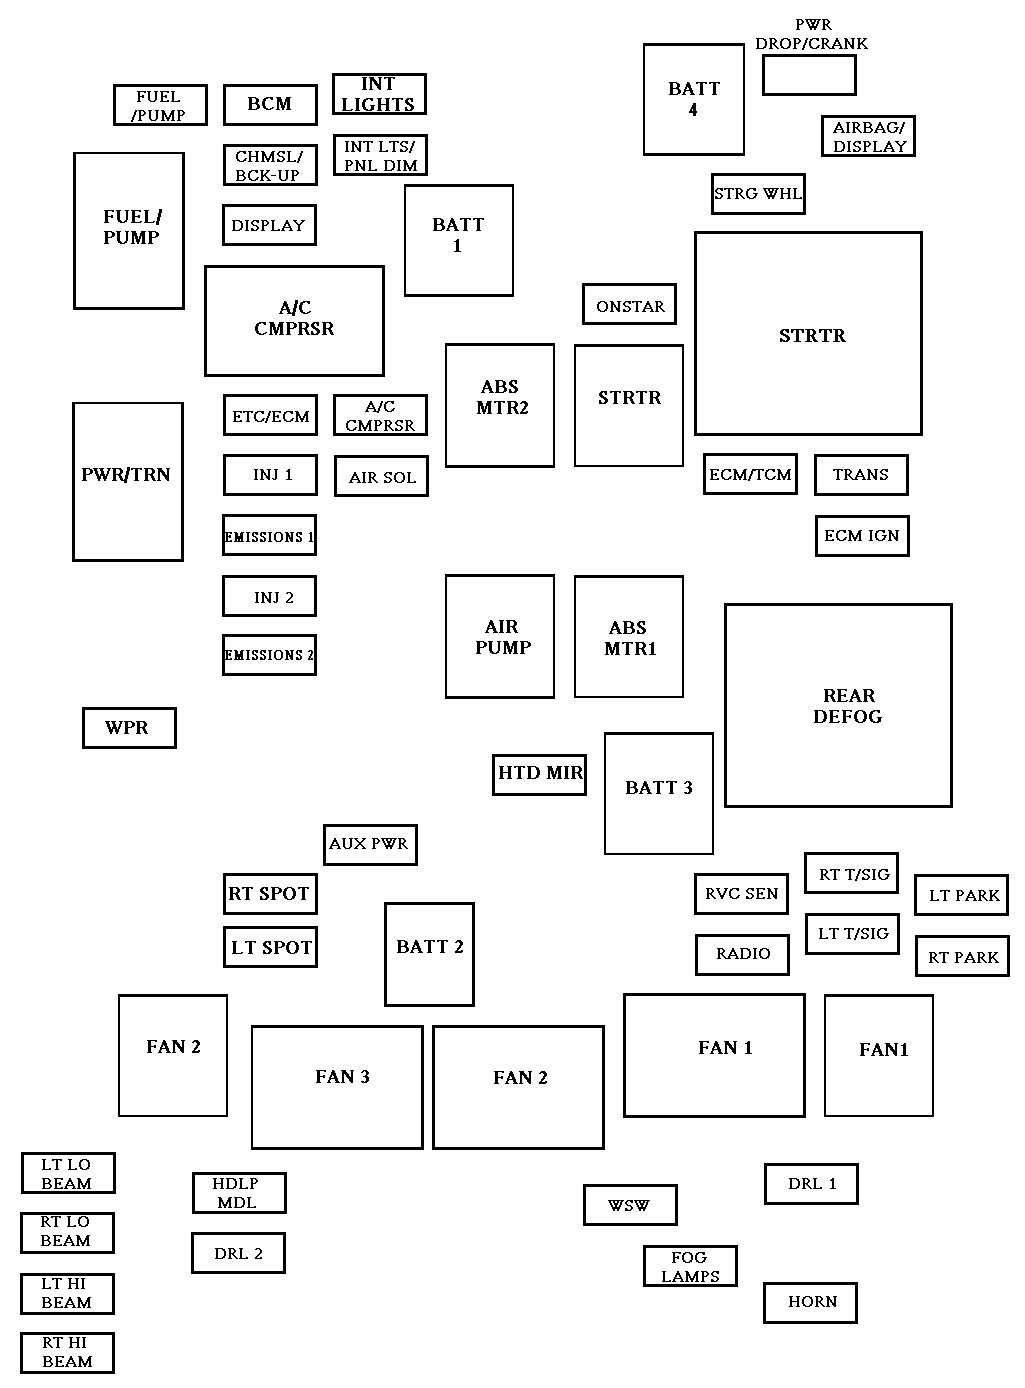 07 impala fuse box wiring diagram schematics2007 impala fuse box wiring diagram database 07 impala fuse box 07 impala fuse box